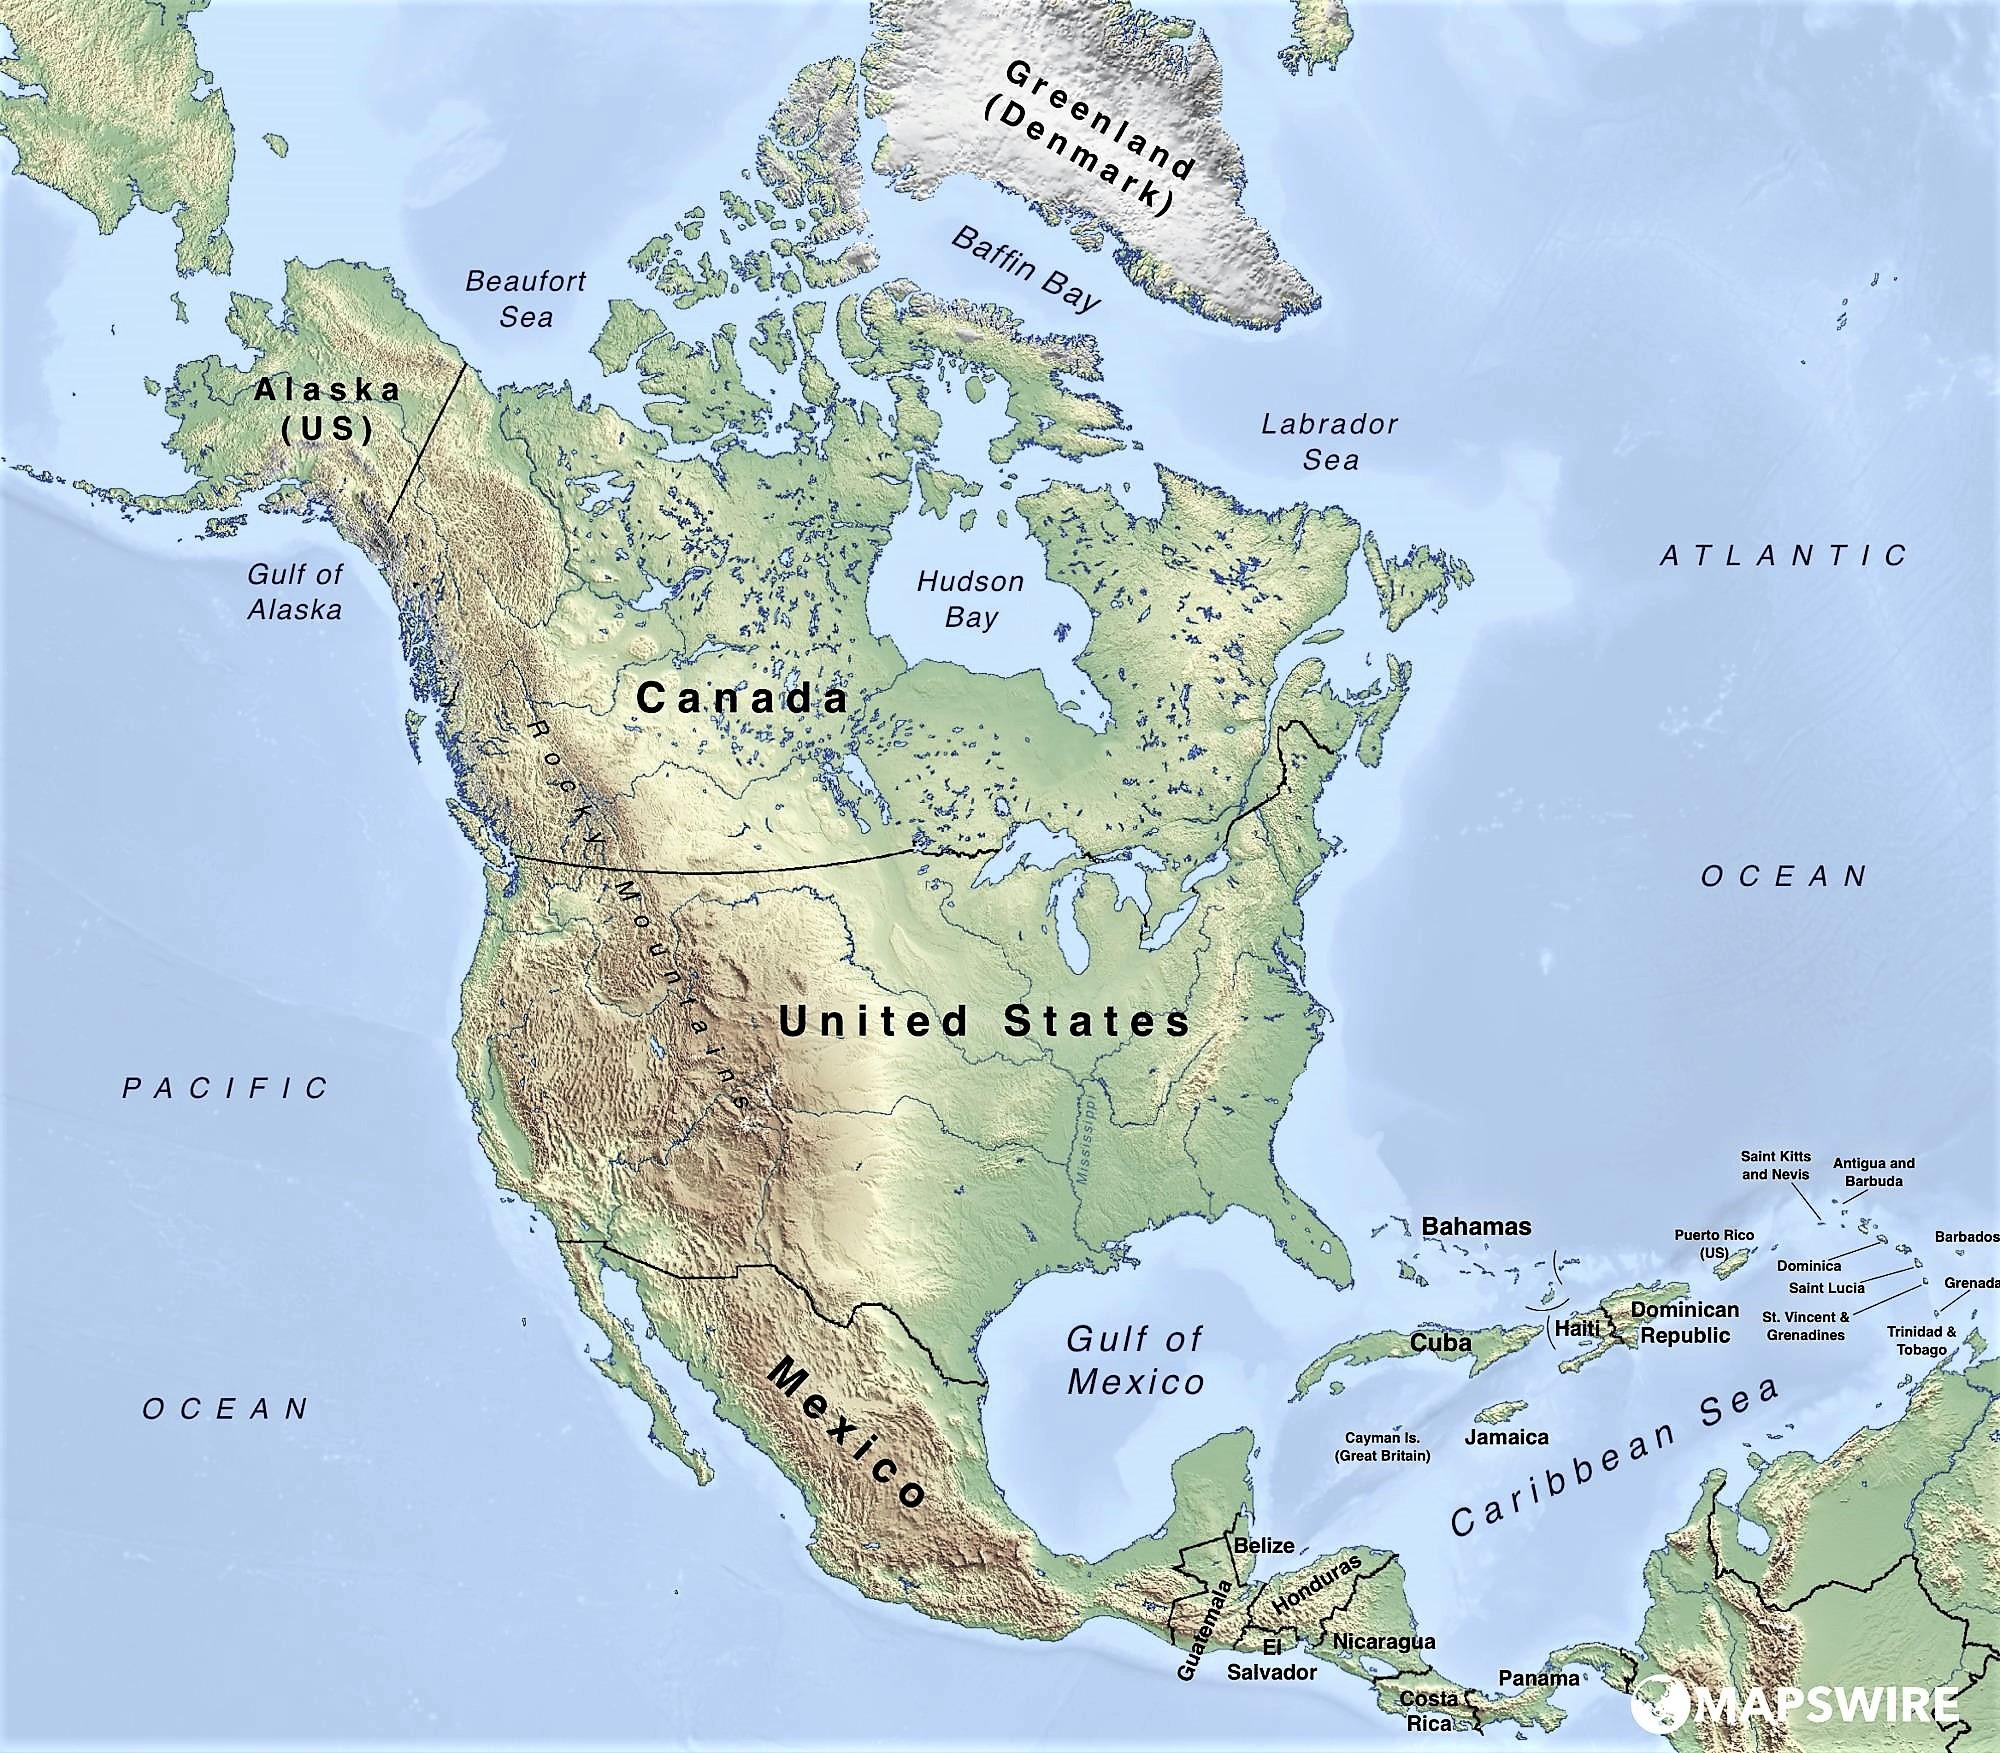 Mapa Fisico De America Mudo.Mapa De America Del Norte Norteamerica Politico